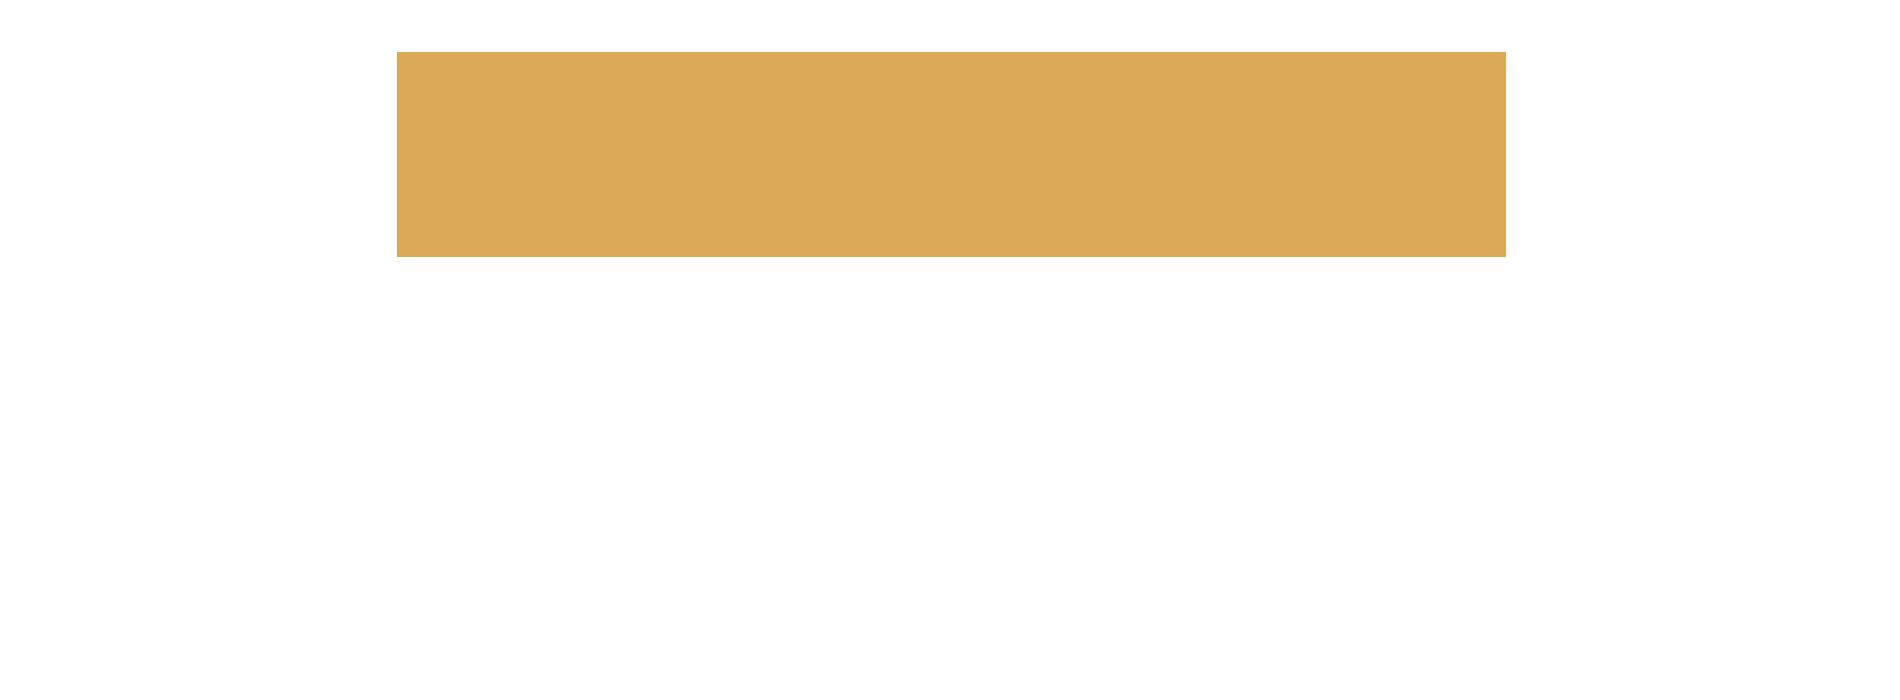 breadcrumb-degah